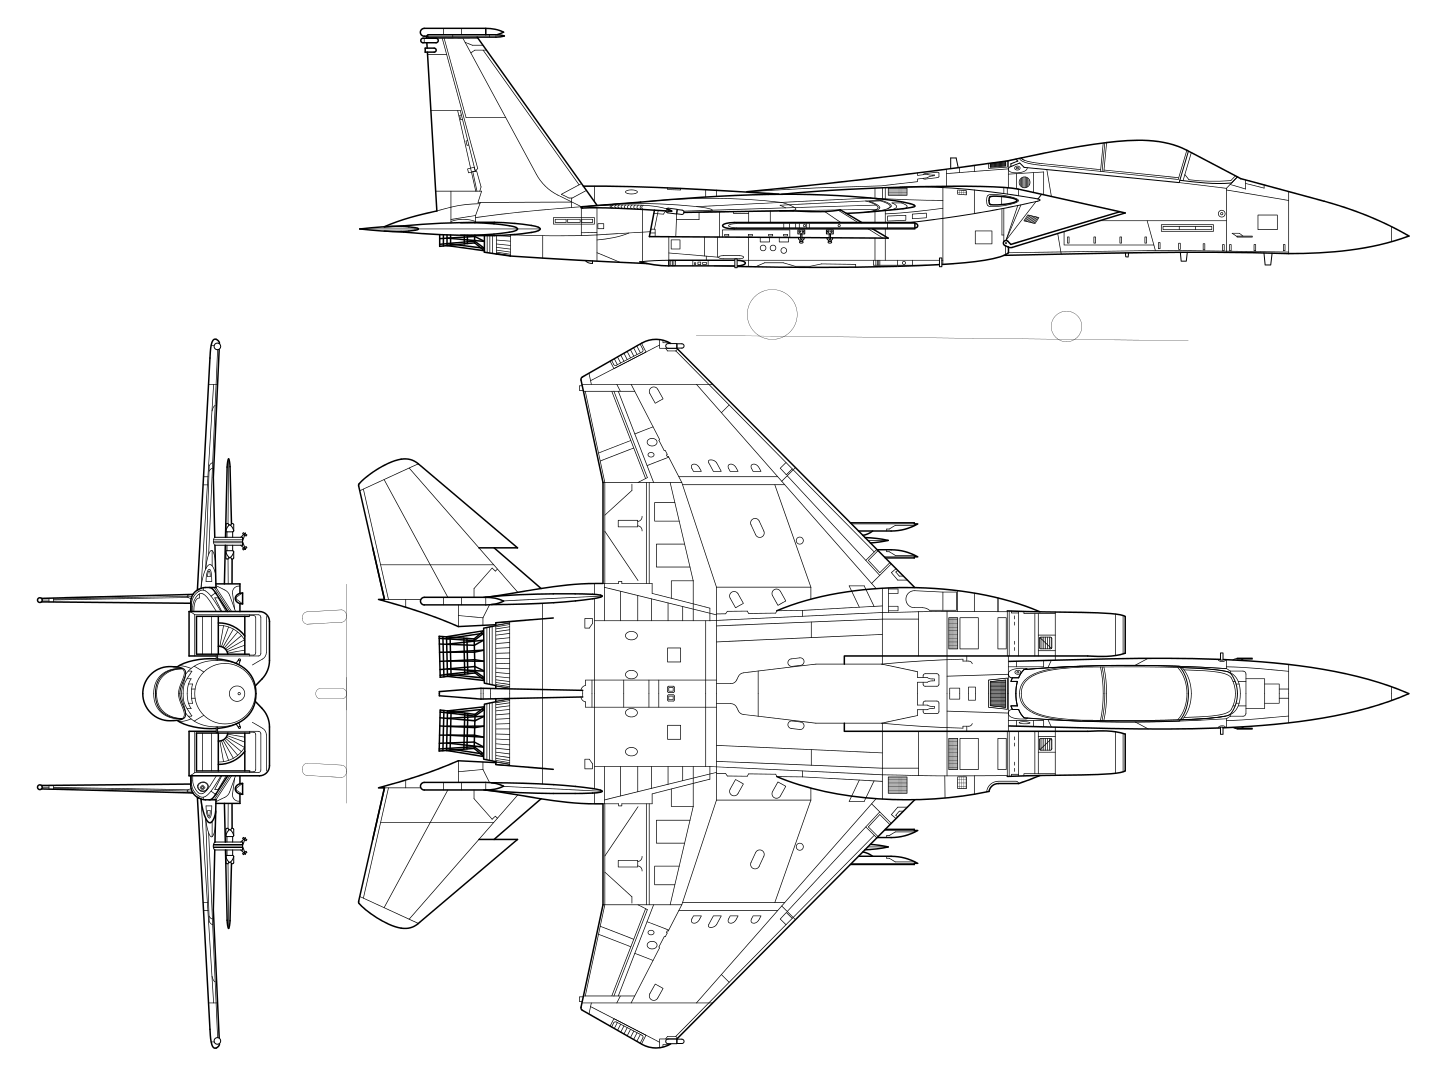 McDonnell Douglas F-15 Eagle | Aircraft design, Airplane design, Fighter  jetsPinterest